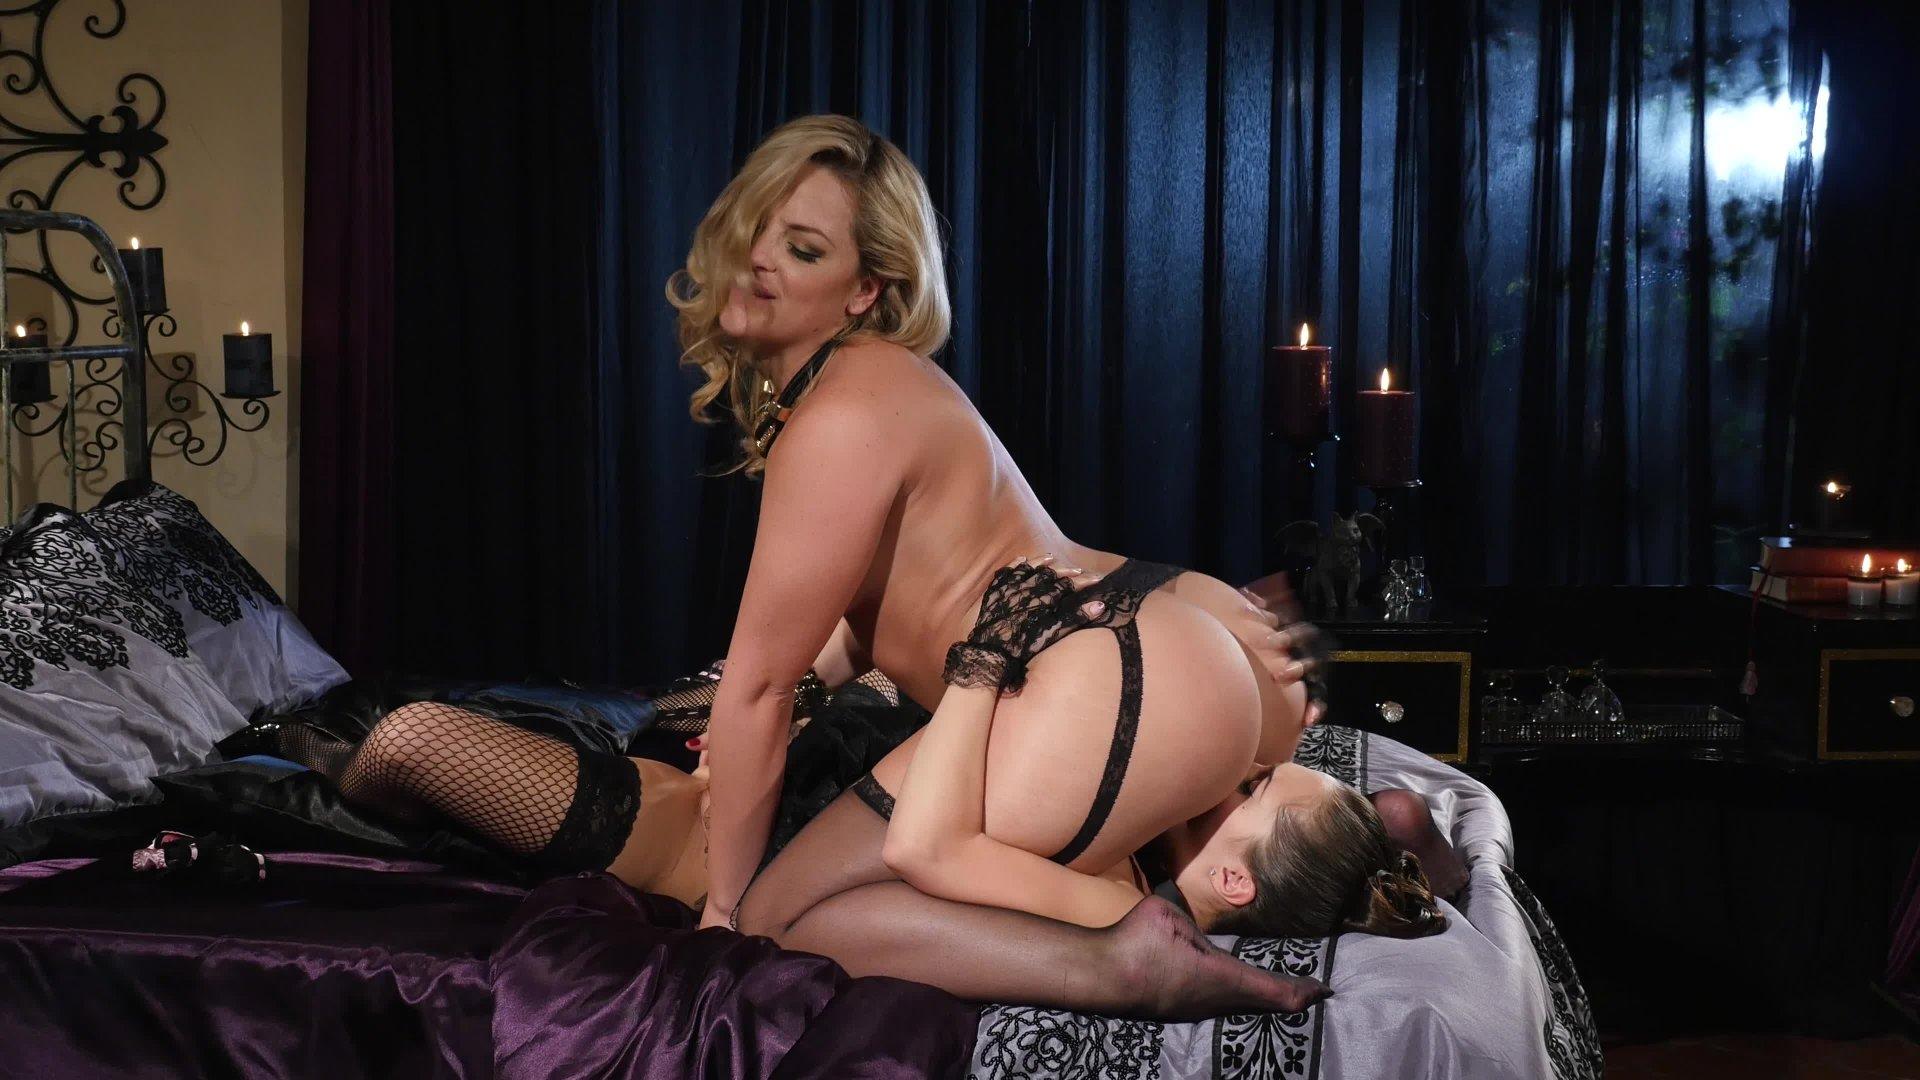 film streaming erotico video hard erotico